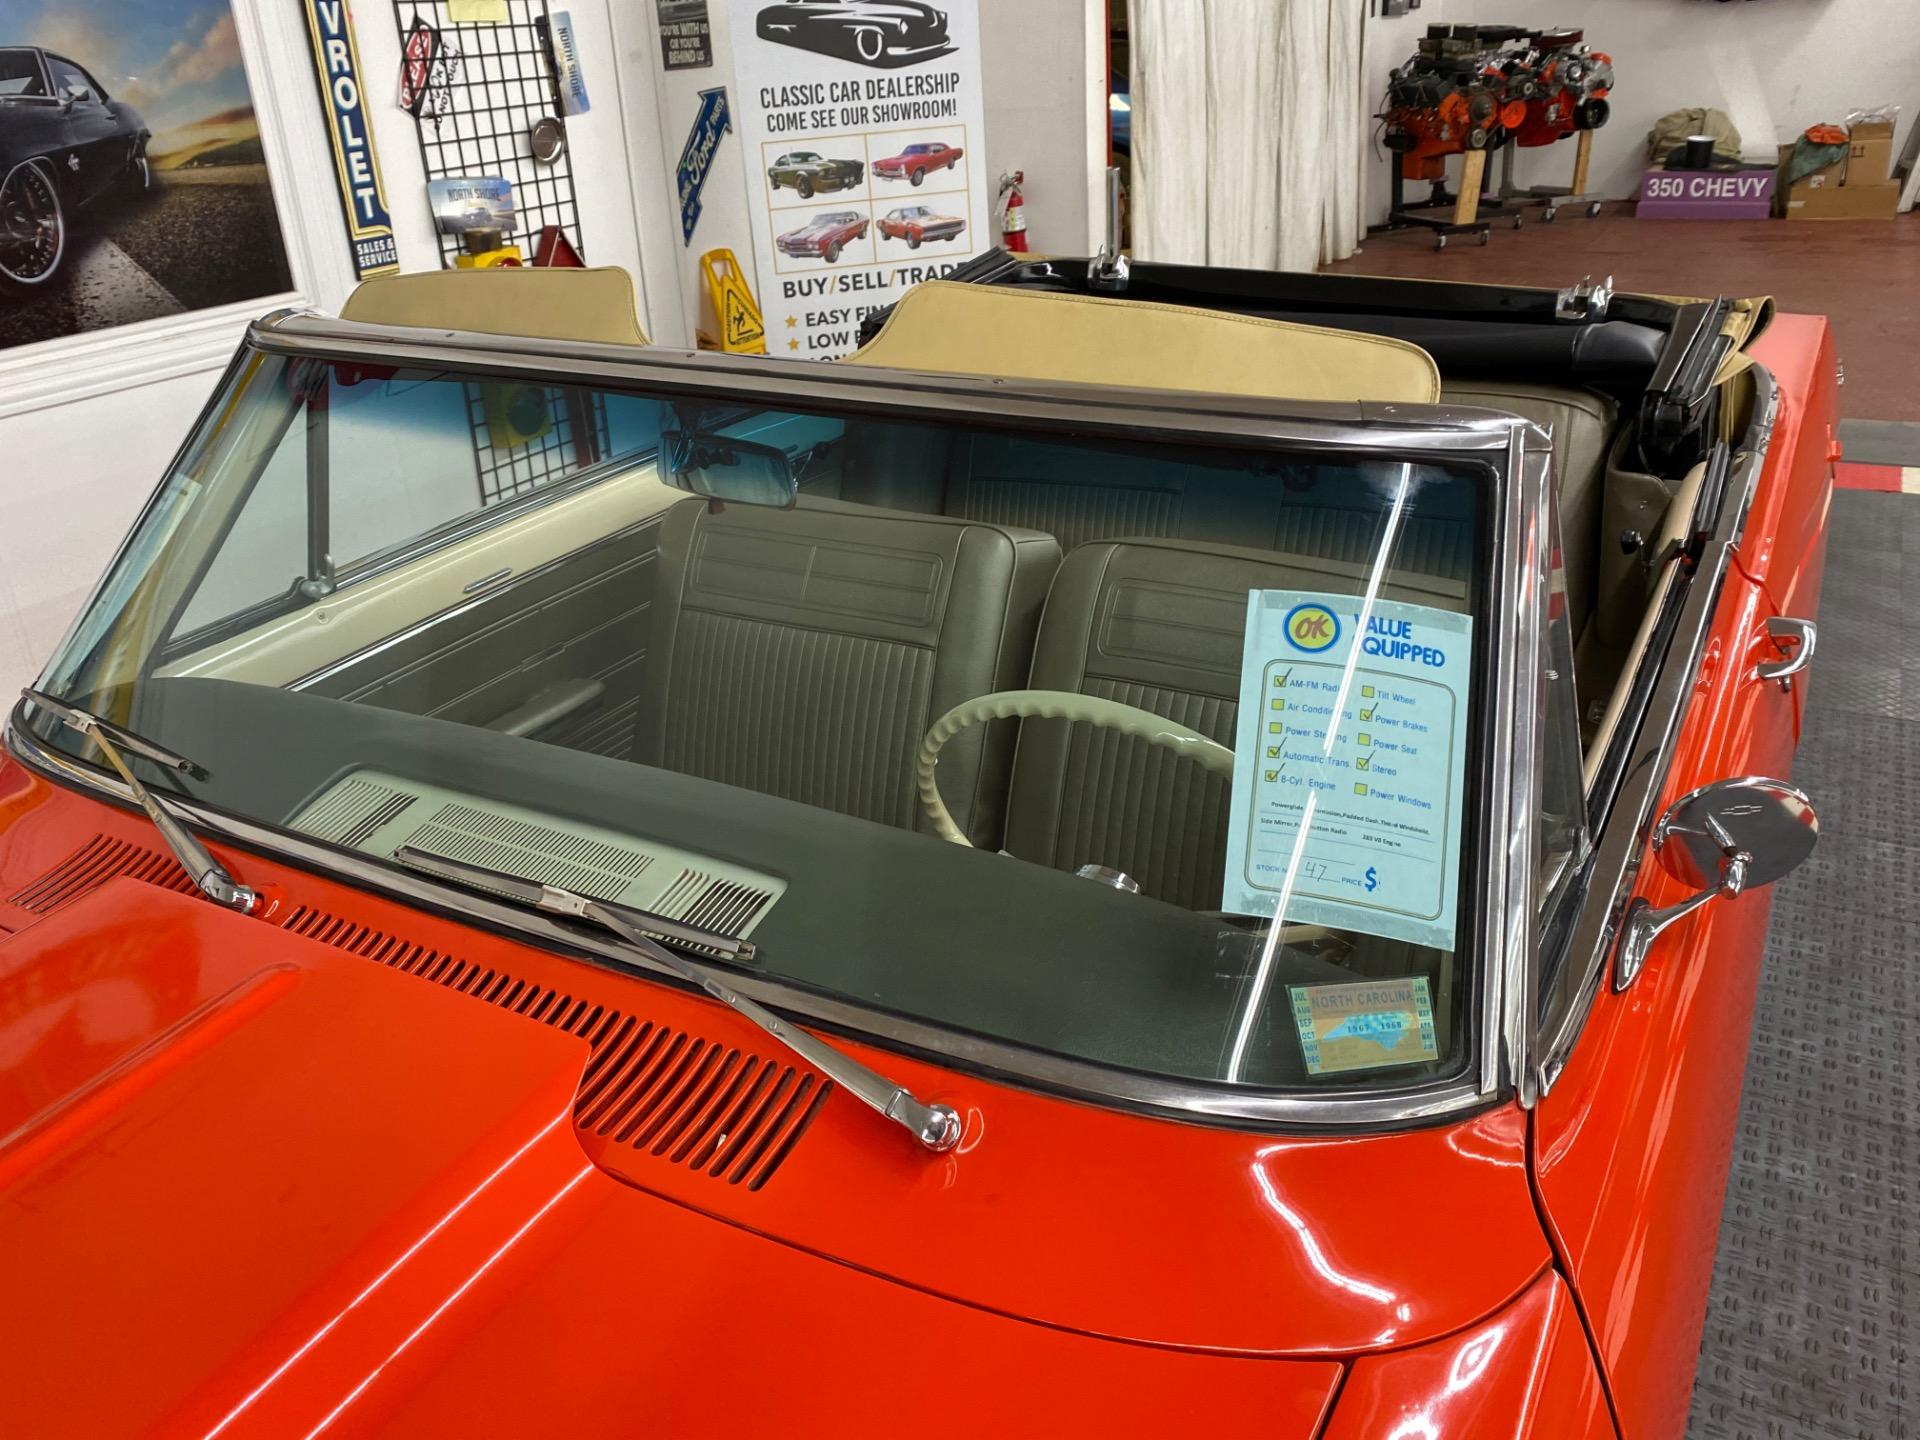 Used 1963 Chevrolet Nova - CONVERTIBLE - 283 V8 - AUTO TRANS - SEE VIDEO | Mundelein, IL